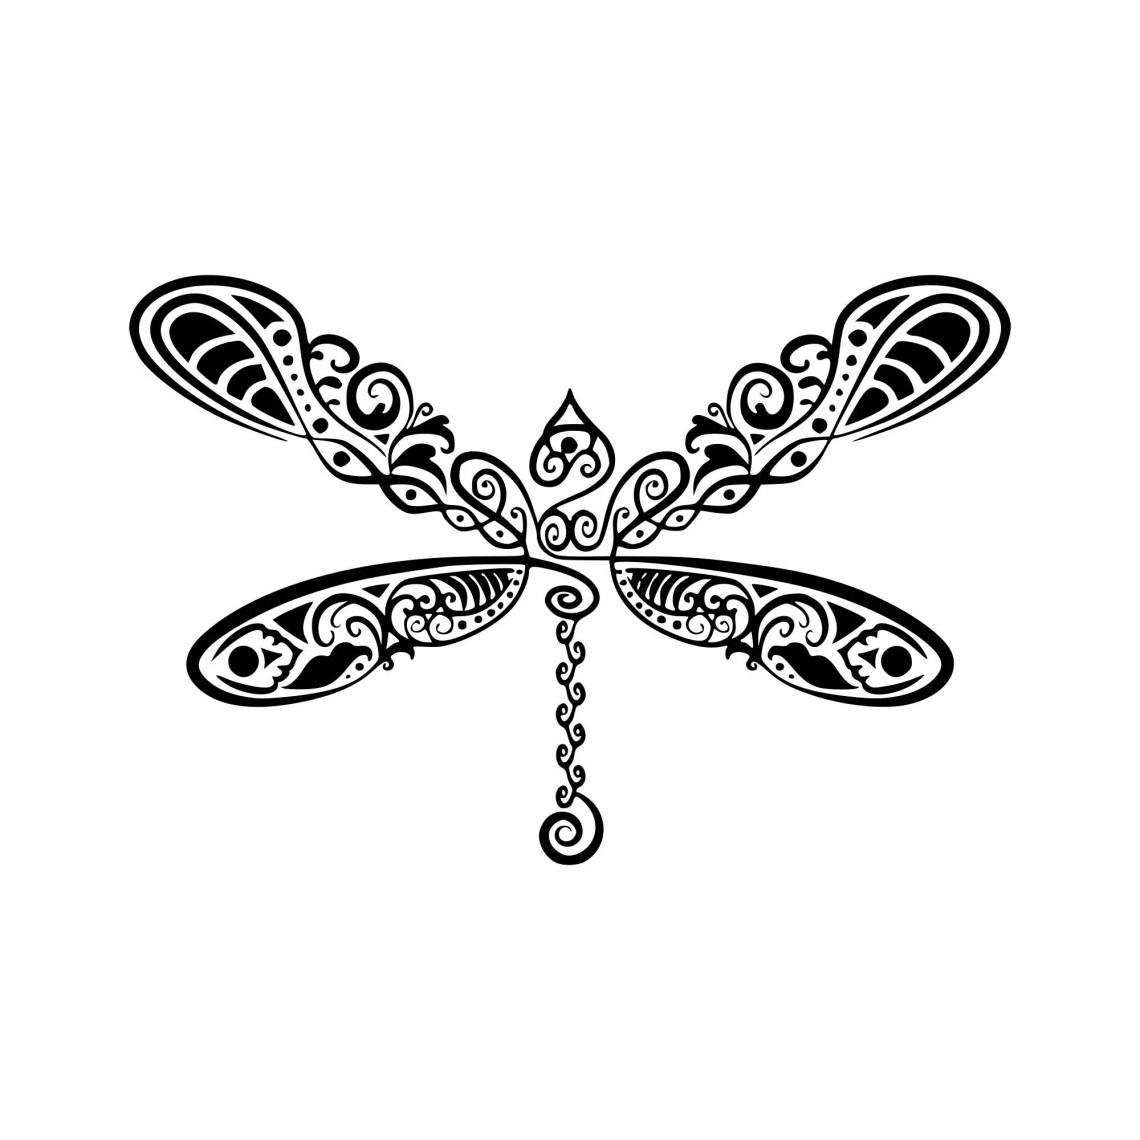 Download Dragonfly svg Dragonfly mandala svg Zentangle dragonfly ...